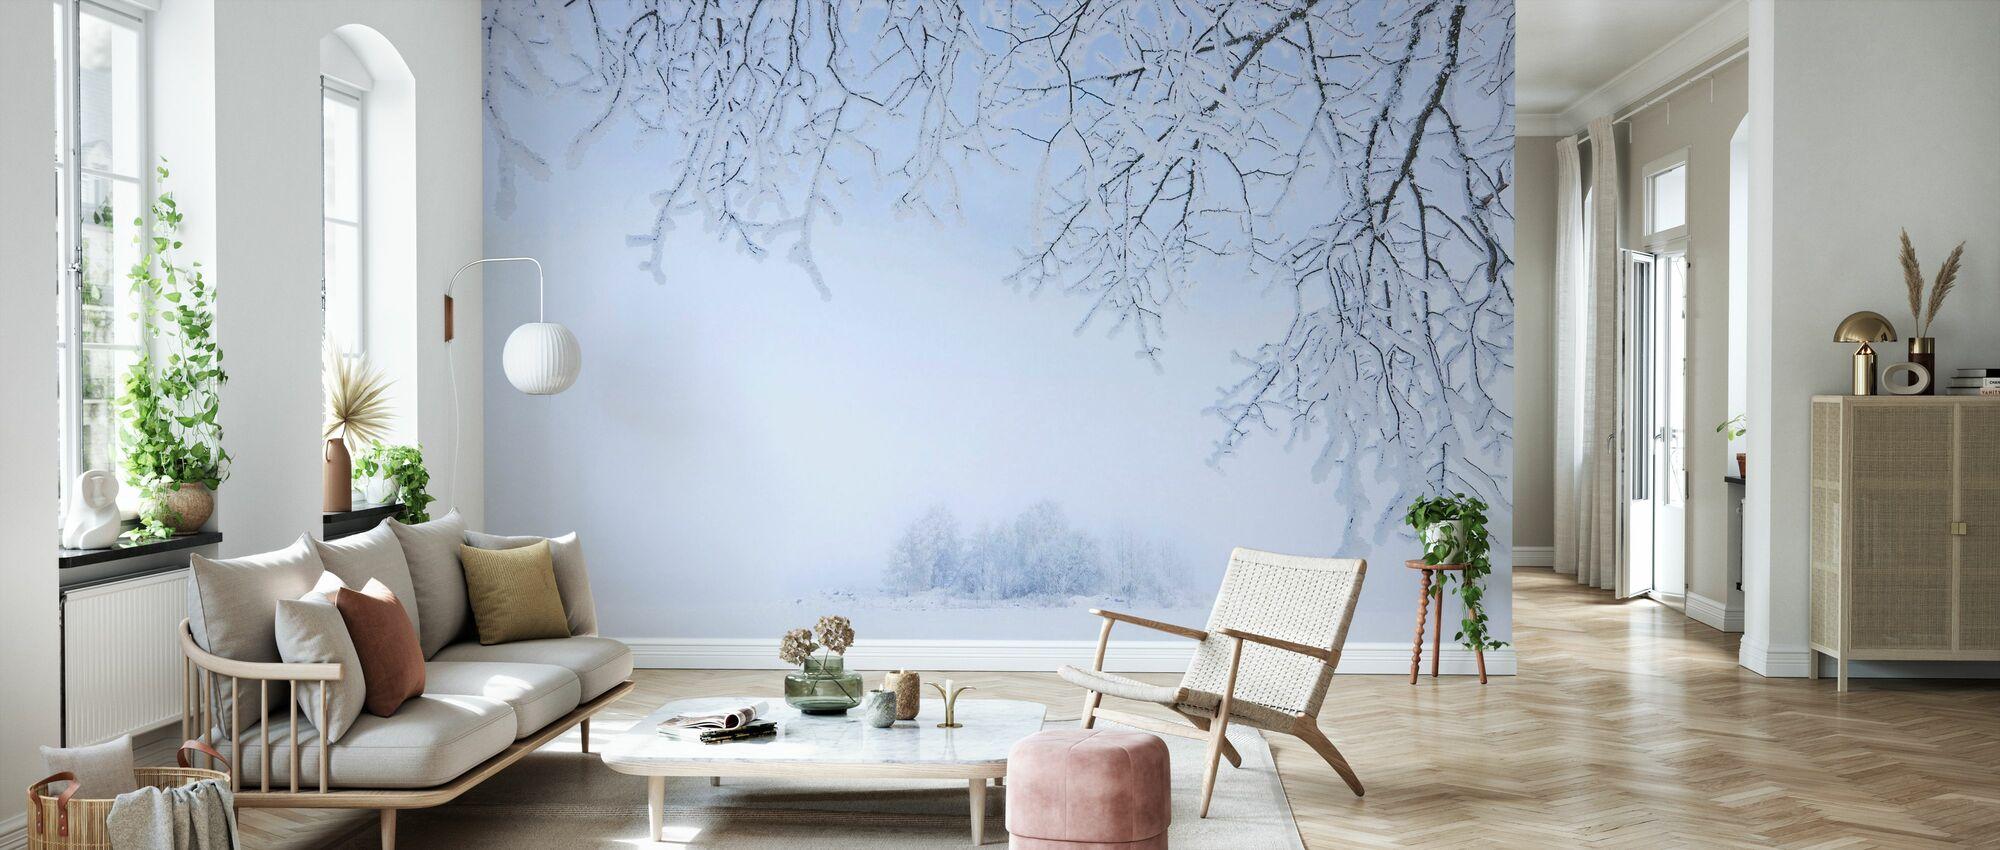 Foggy Winter - Wallpaper - Living Room